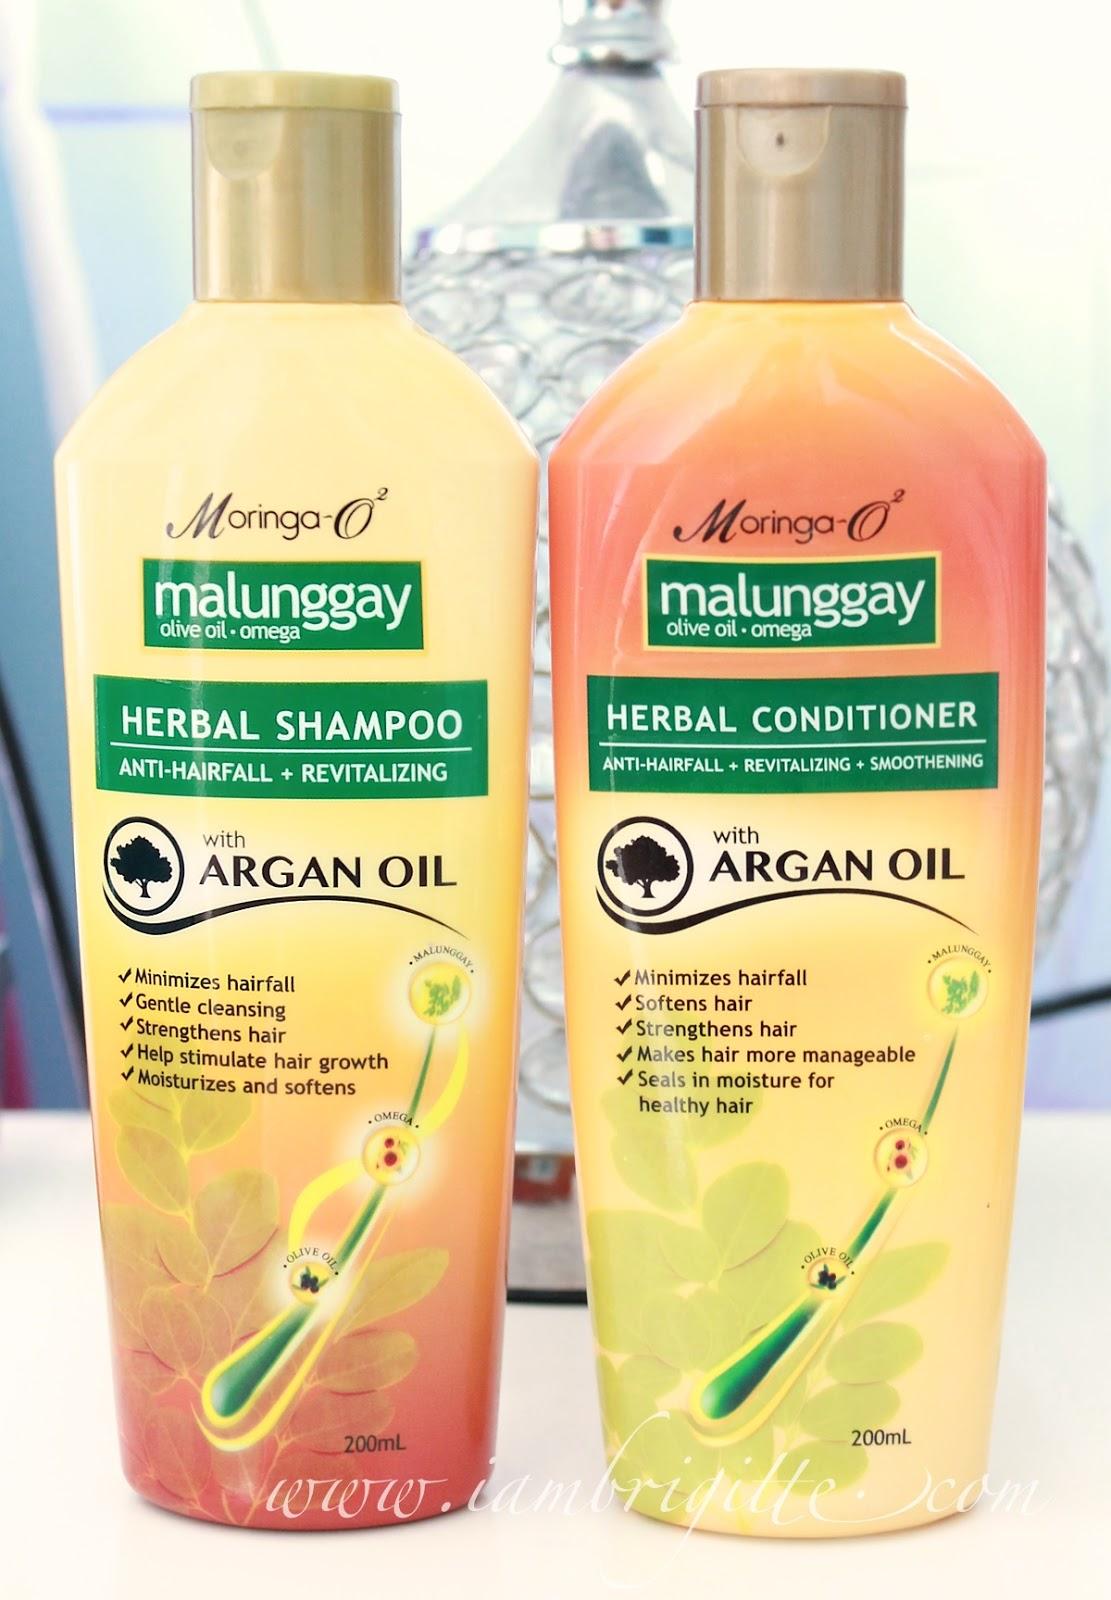 malunggay shampoo Moringa o herbal shampoo with argan oil brings together nature's powerful multi-vitamins malunggay (moringa) olive omega (sunflower) and argan oils.